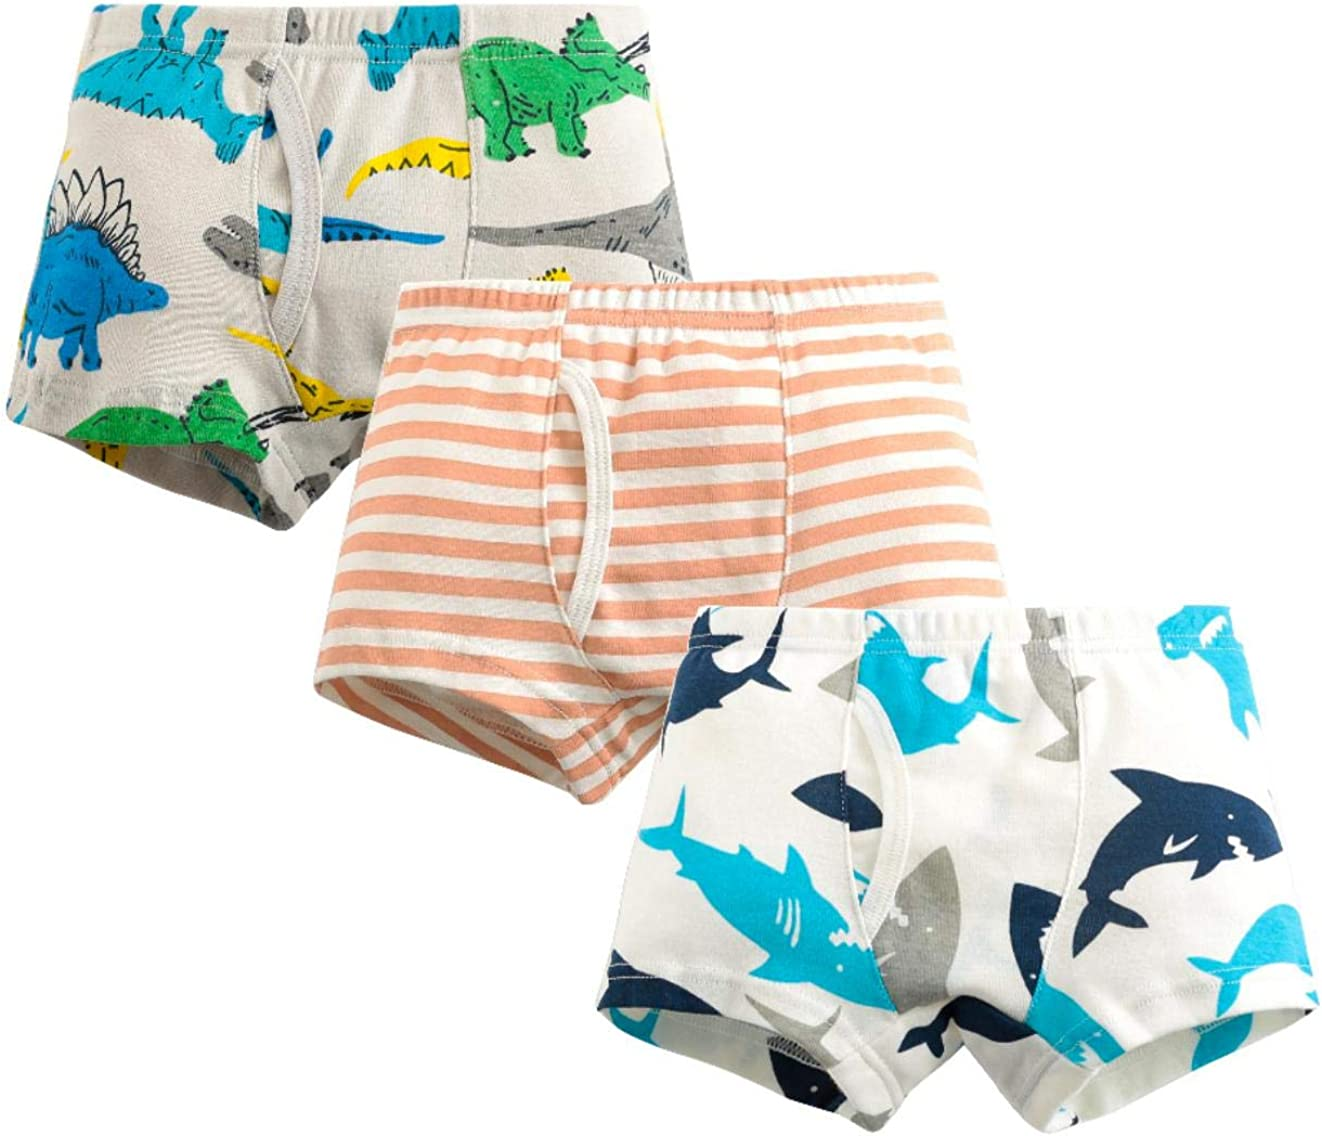 MIMY Boys Soft Cotton Boxer Briefs Toddler Kids Baby Underwear Dinosaur Truck Training Panty 3 Pack 3-10Y Blue